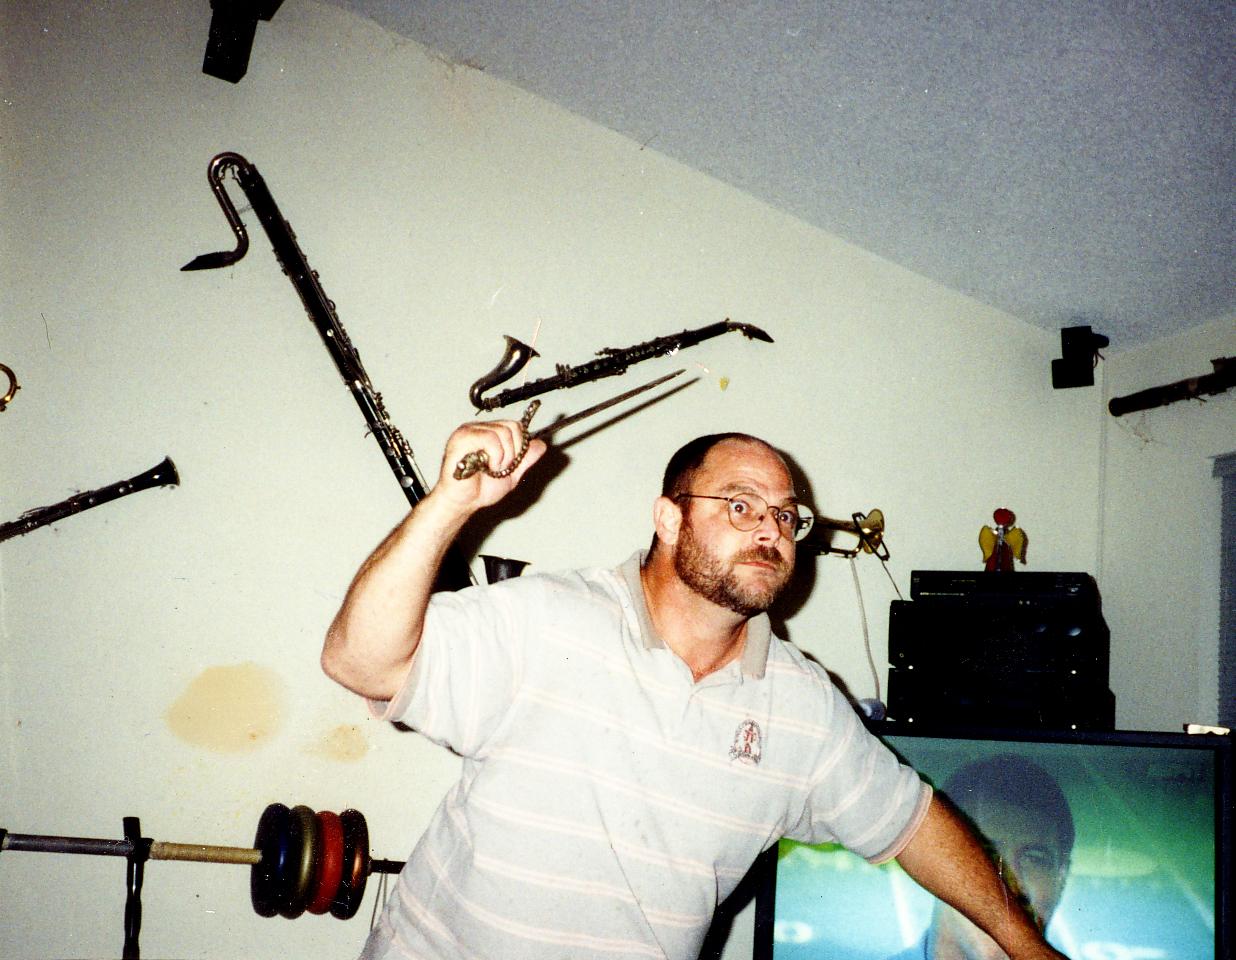 FAT FRANK WITH SWORD.jpg